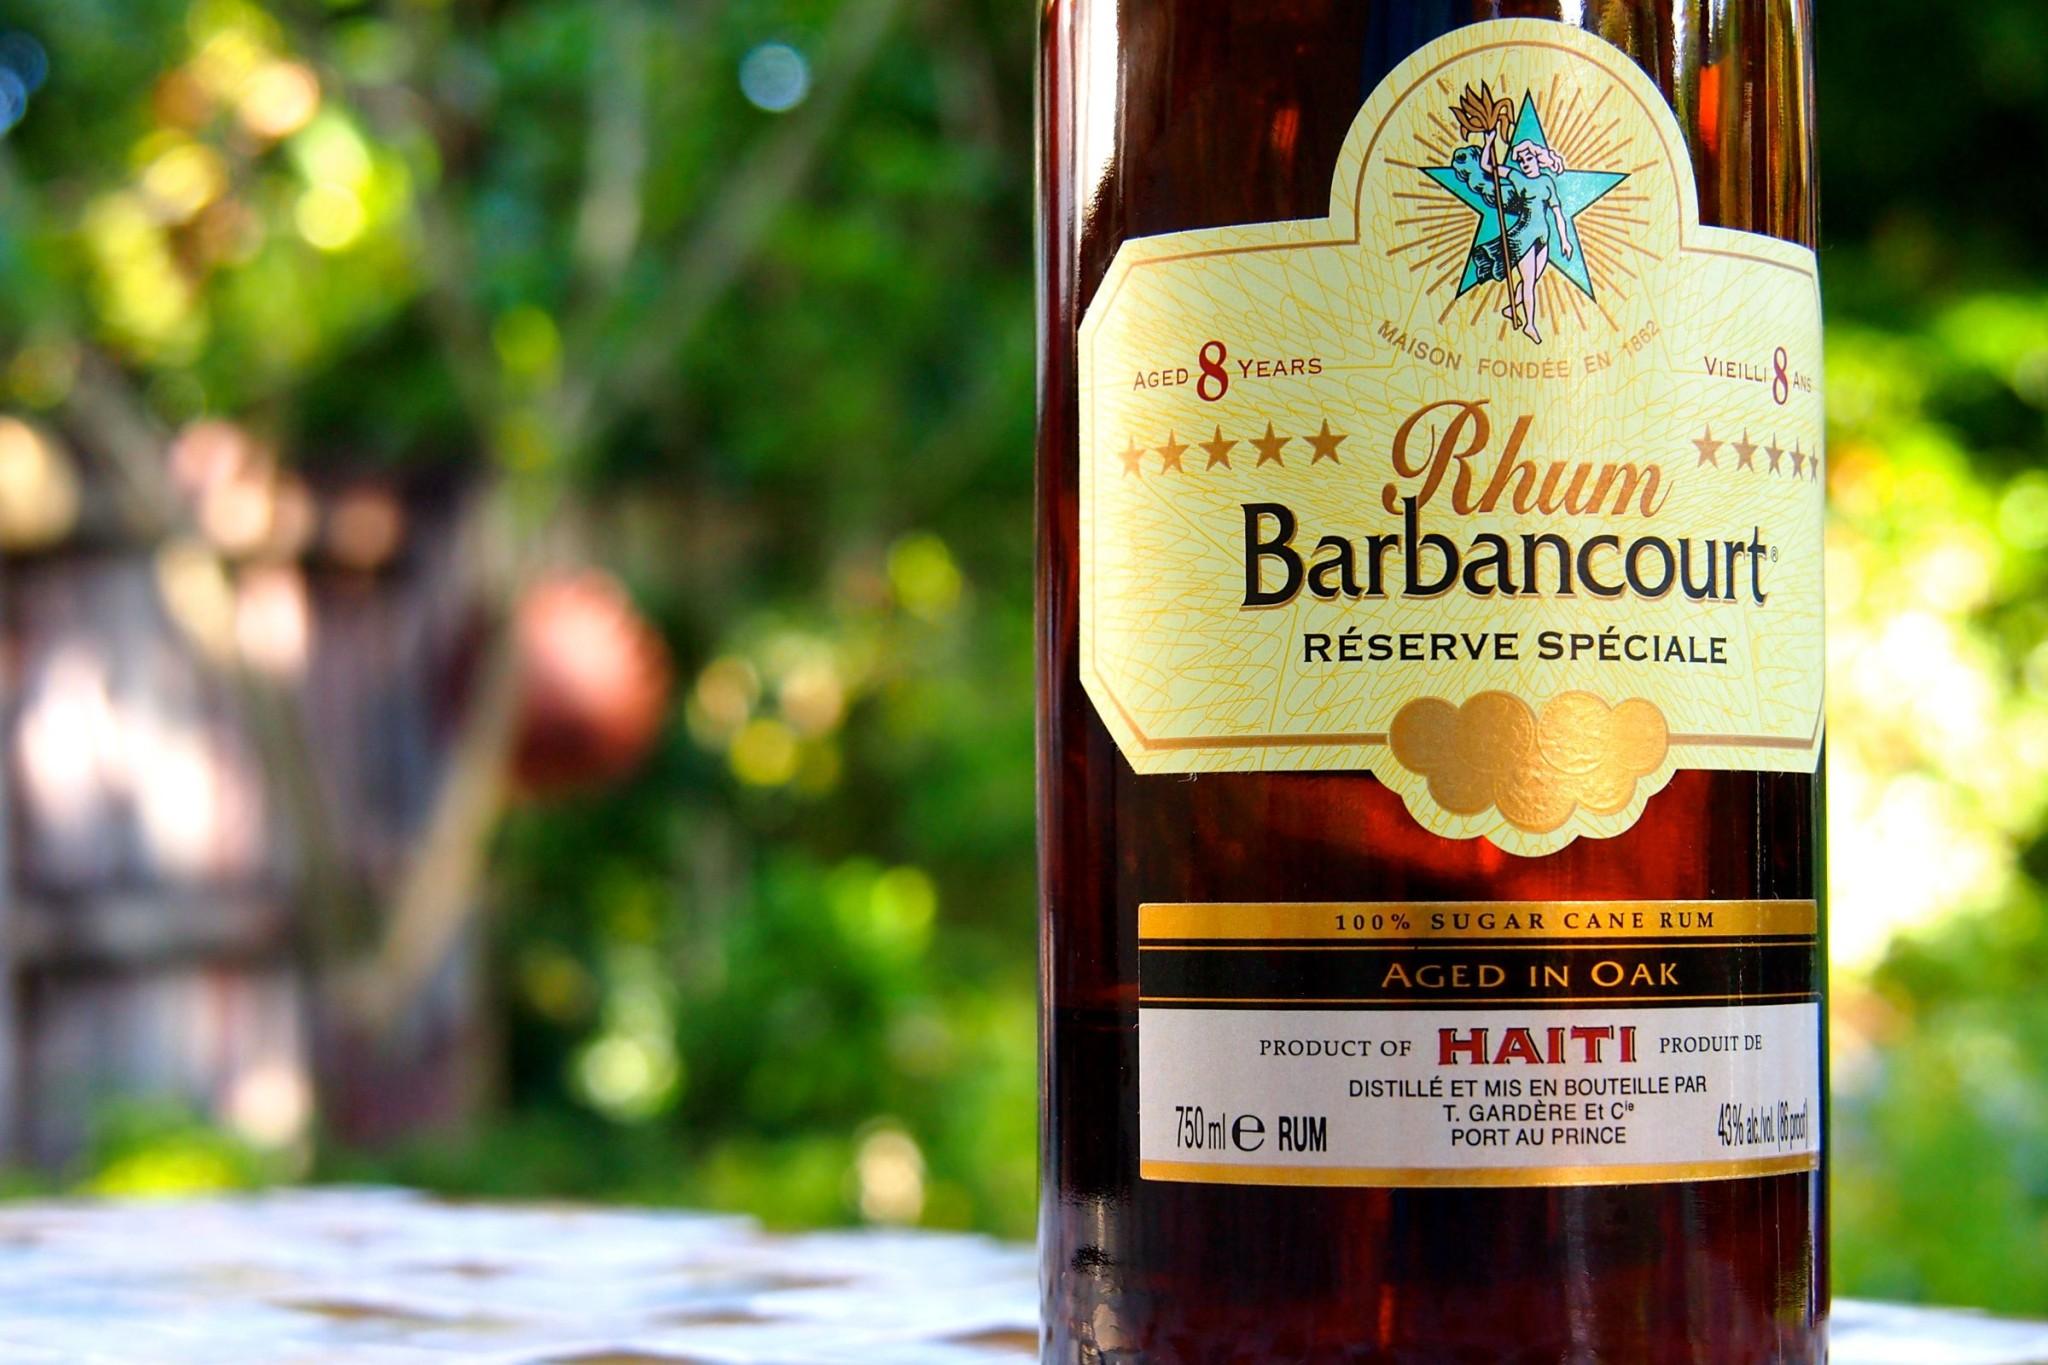 Rhum Barbancourt: How to Drink Haitian Rum Like a Local